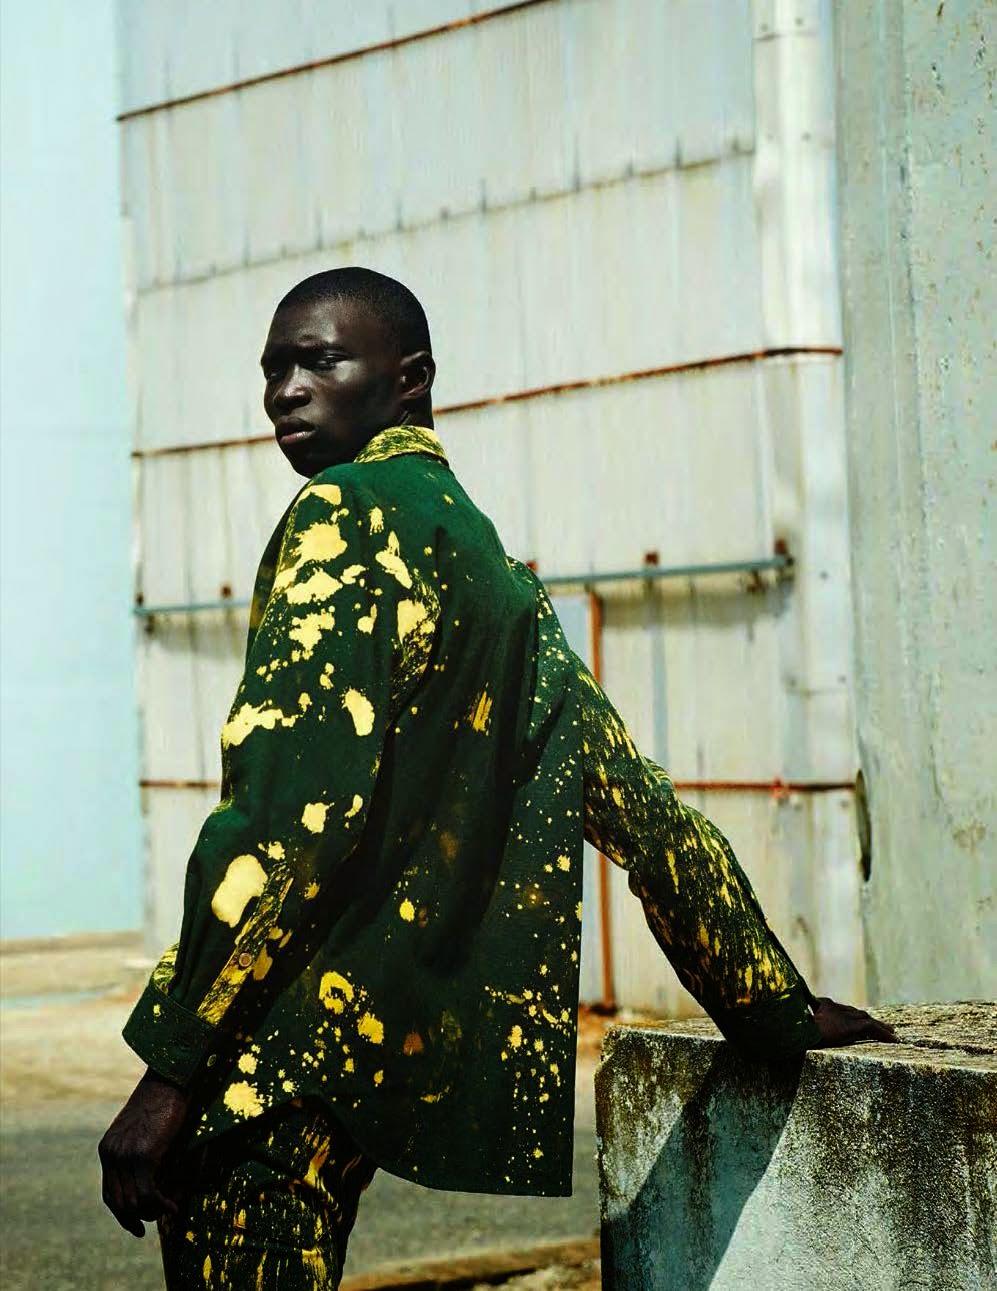 raf simons  x  ruby sterling  editorial // shot by julia non i  // styled by tobias frericks   // gq germany     fall 2014